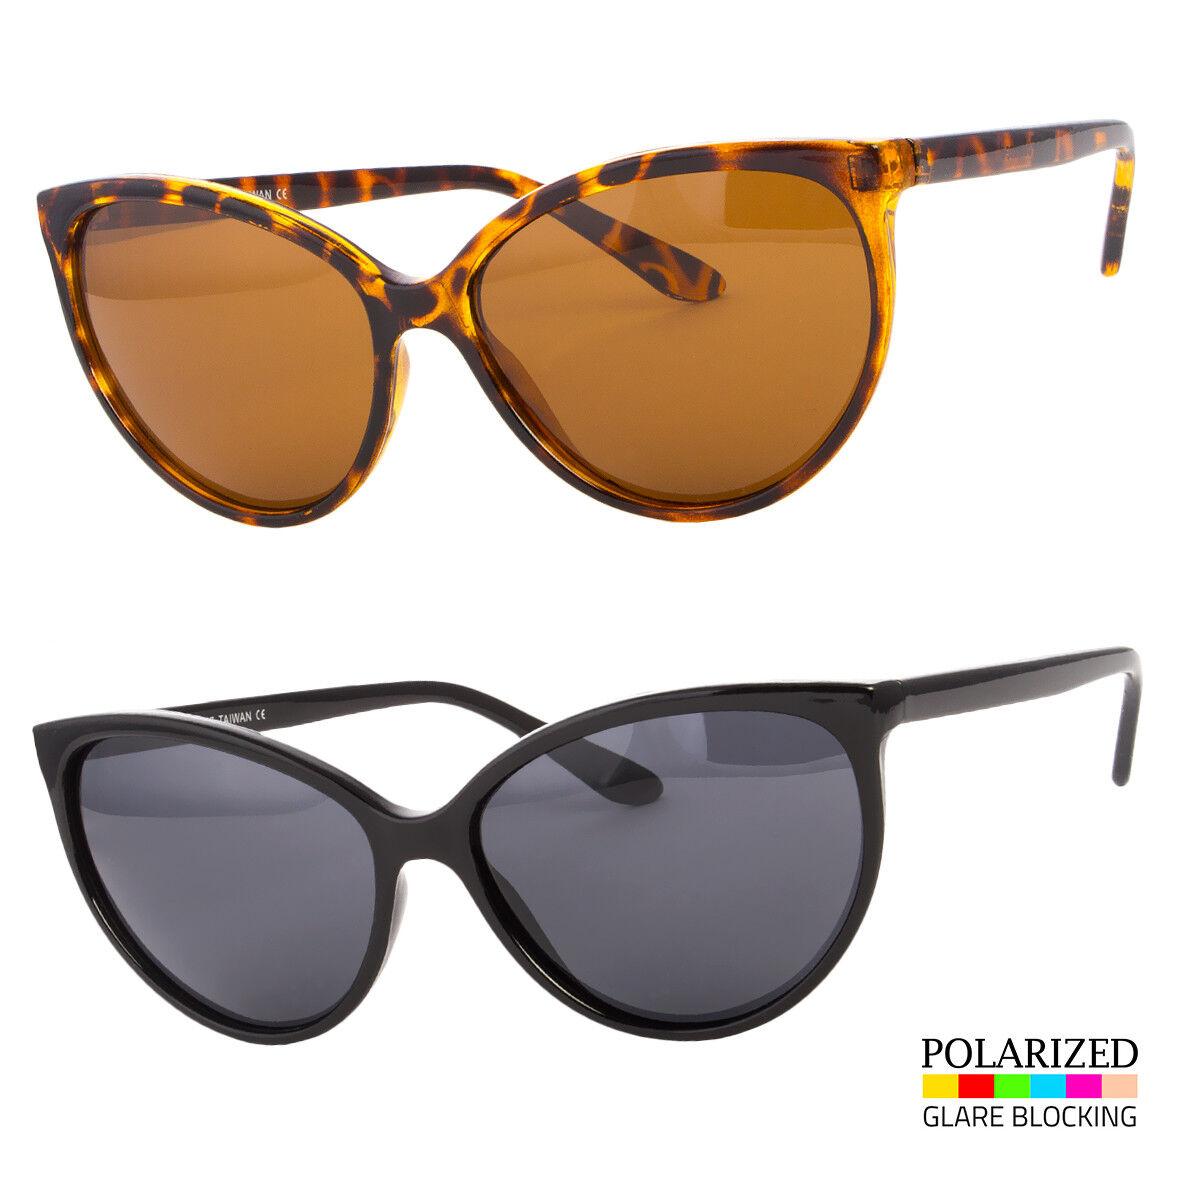 New Retro Women's Polarized Classic Cat Eye Designer Fashion Shades Sunglasses